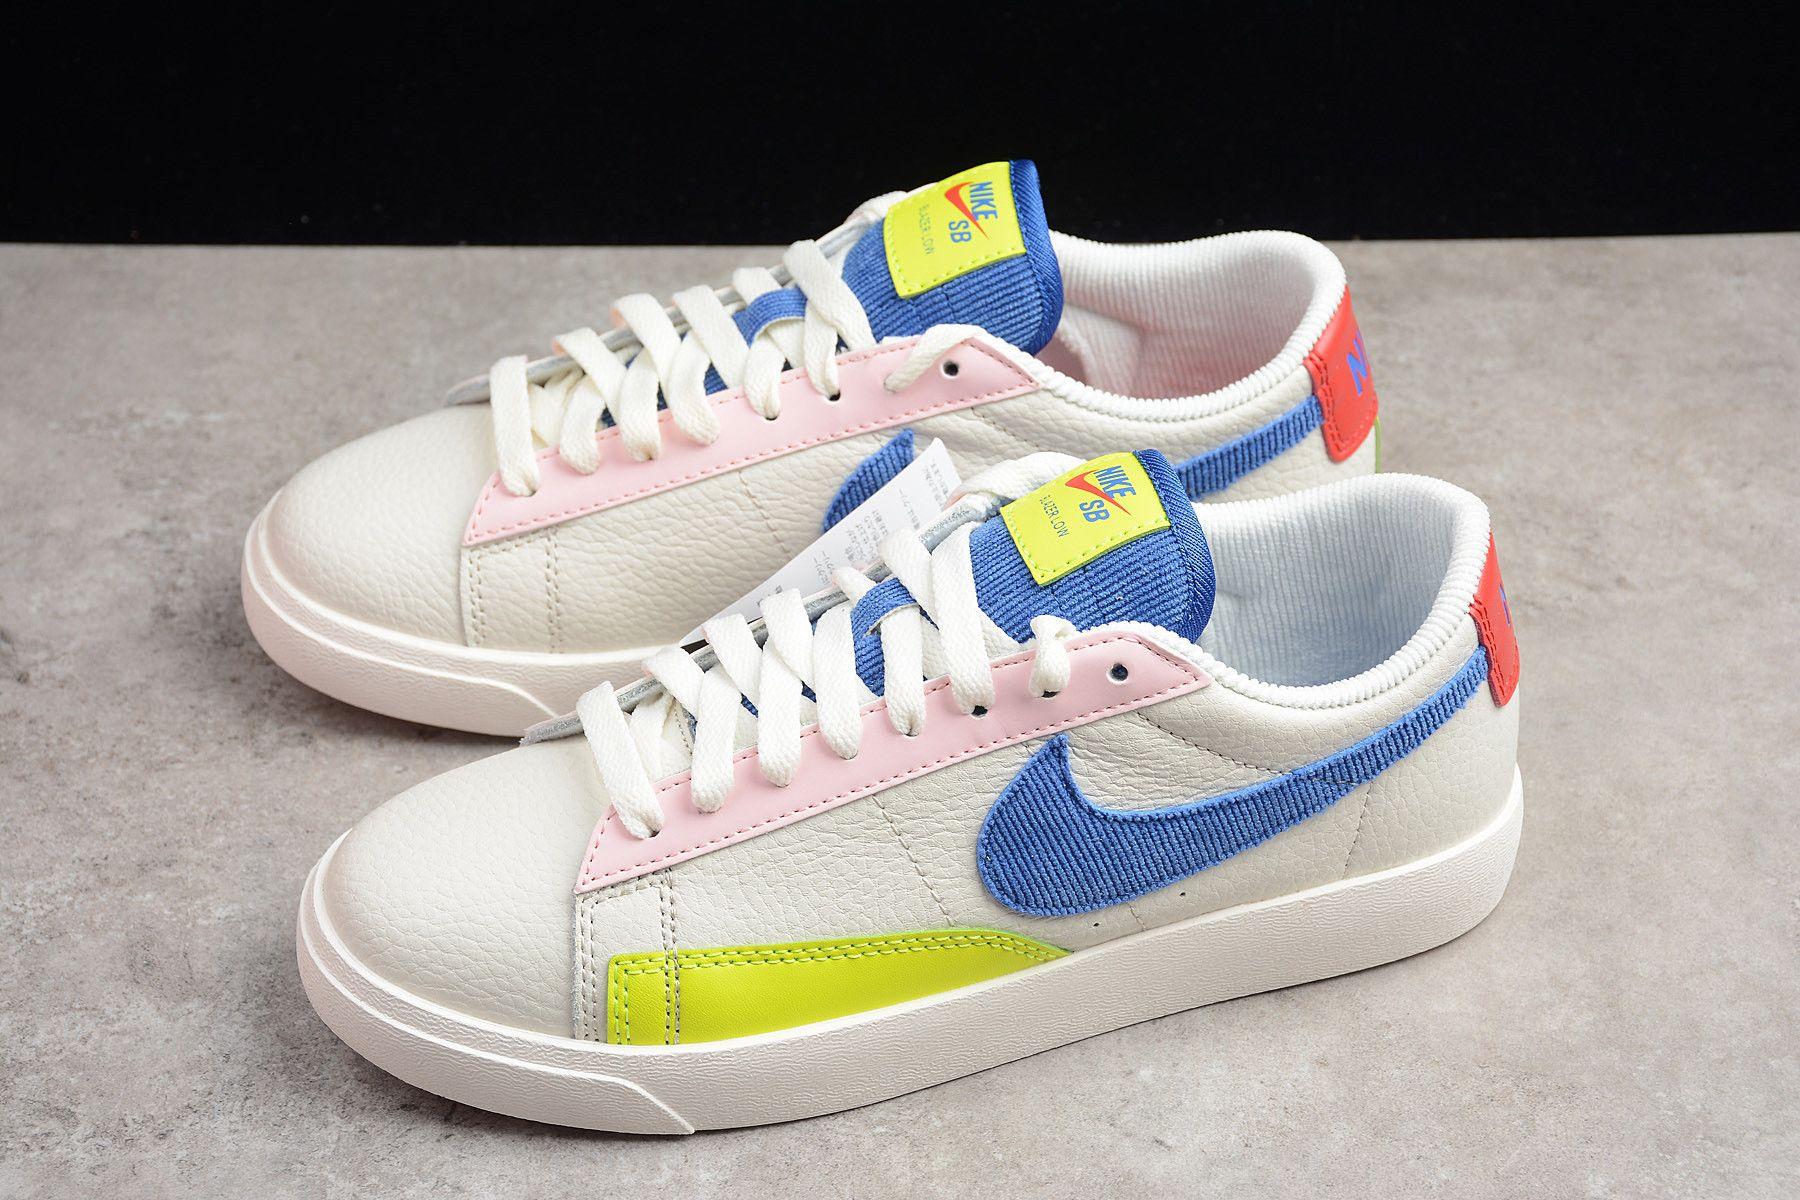 wholesale dealer 48888 cf936 Women's Nike Blazer Low Sail/Racer Blue-Arctic Pink AQ4140-101 in ...